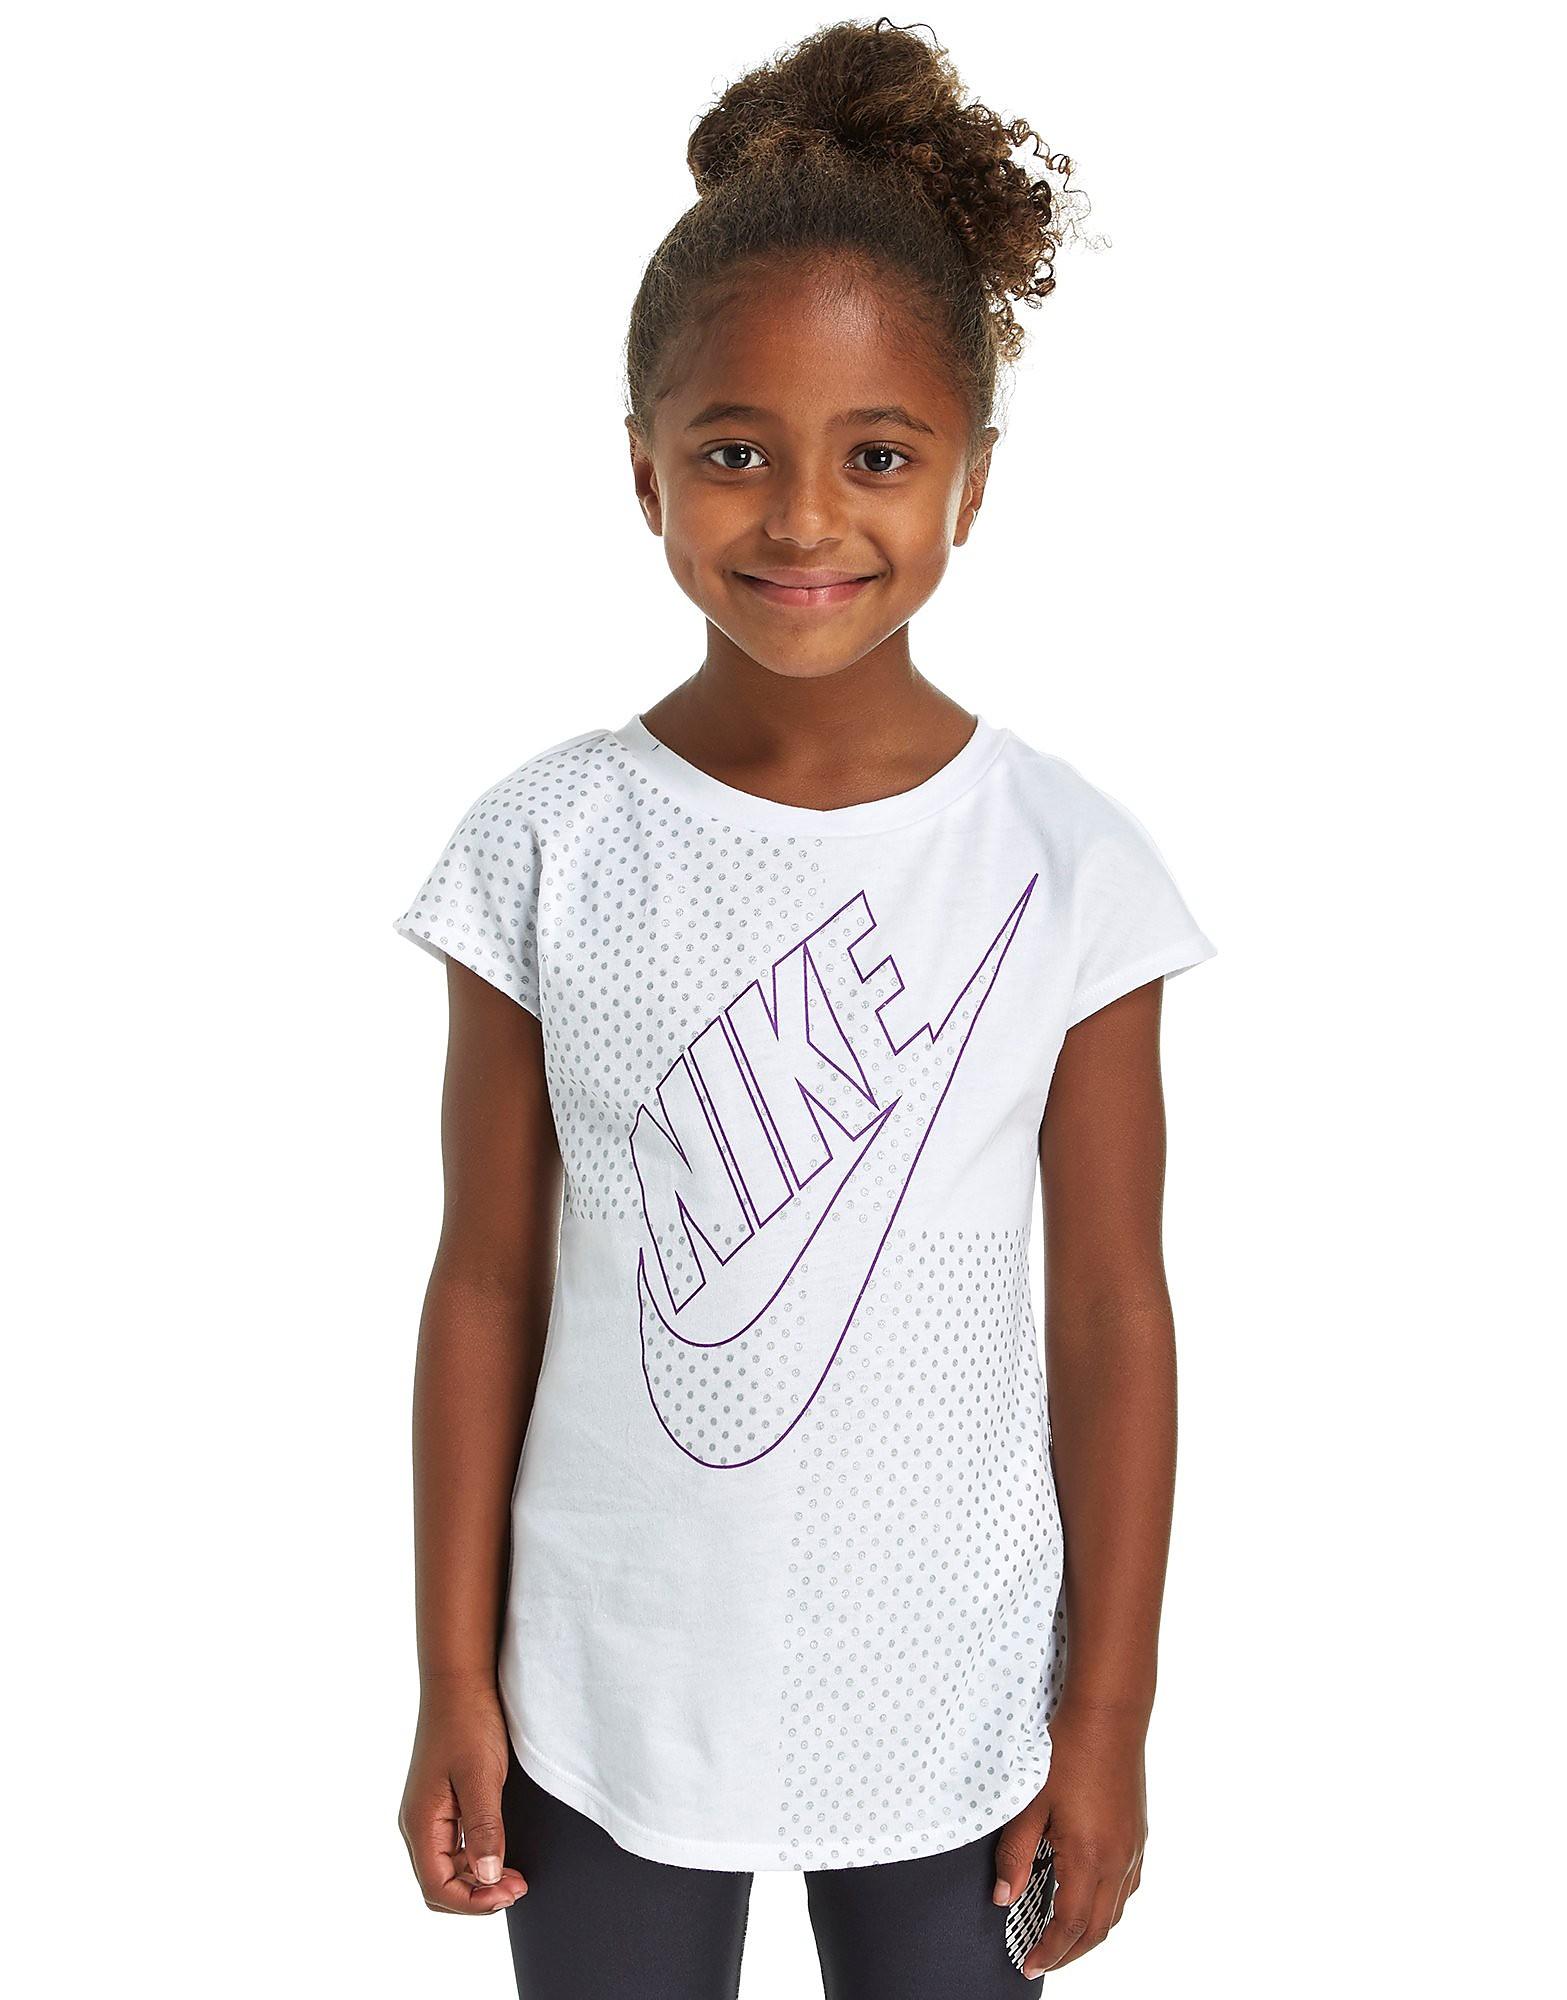 Nike camiseta Futura infantil